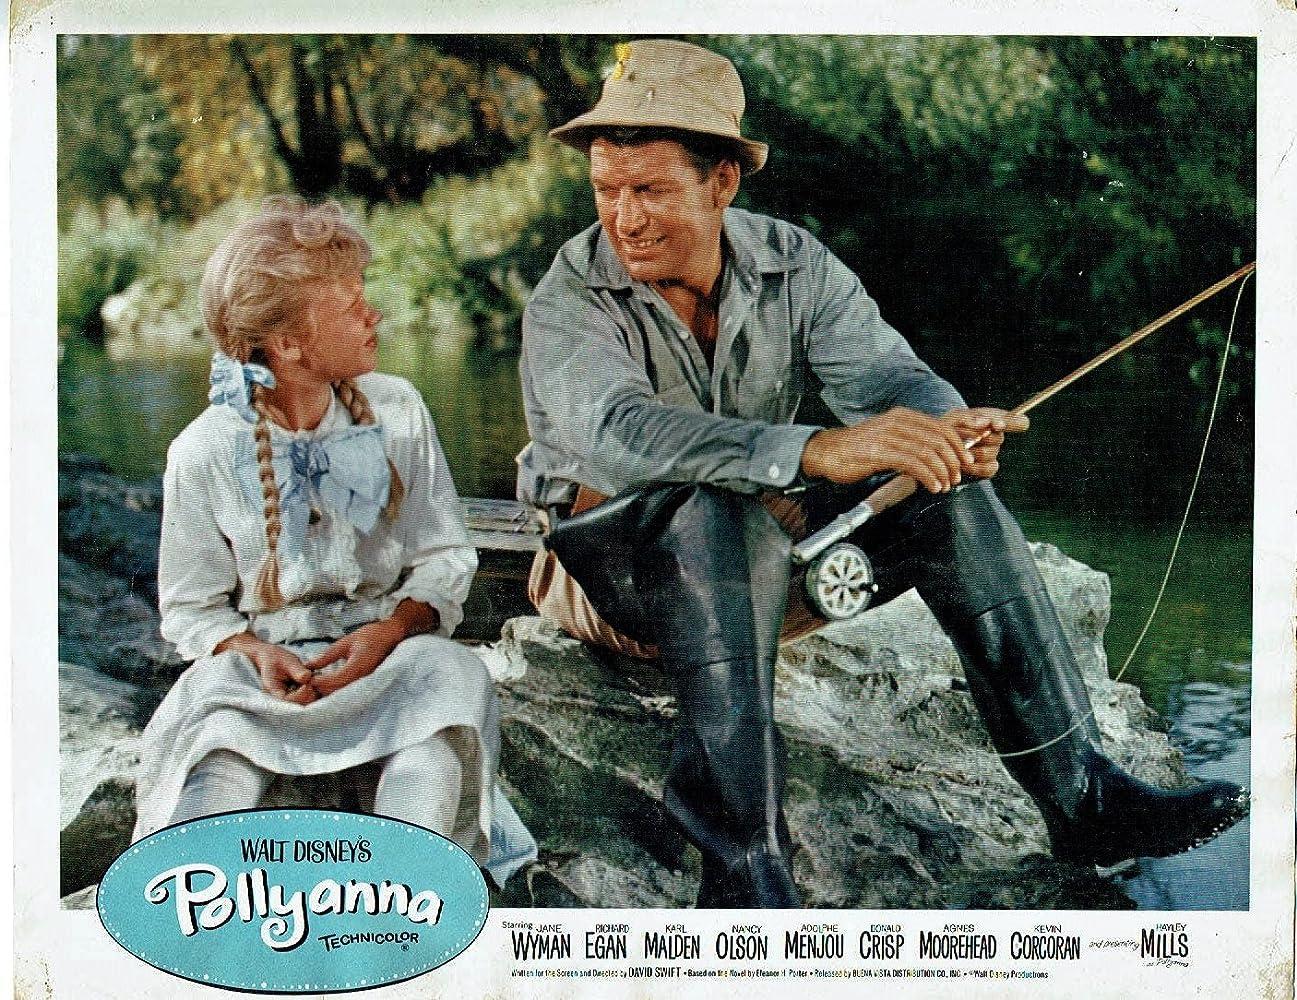 Hayley Mills and Richard Egan in Pollyanna (1960)